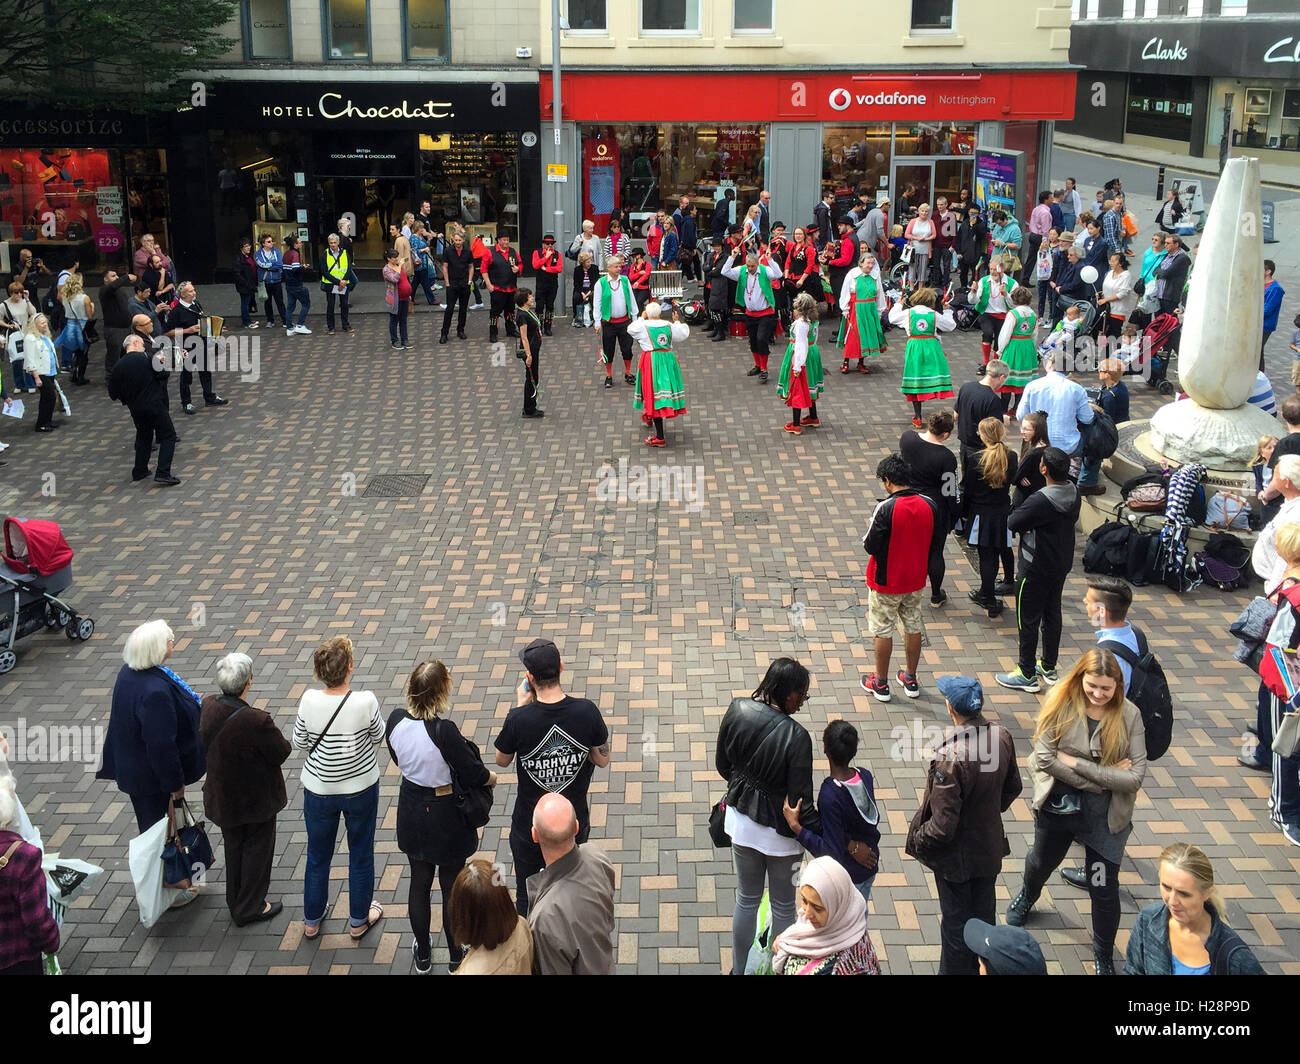 Morris dancers performing, Albert Street. In Nottingham, England. - Stock Image